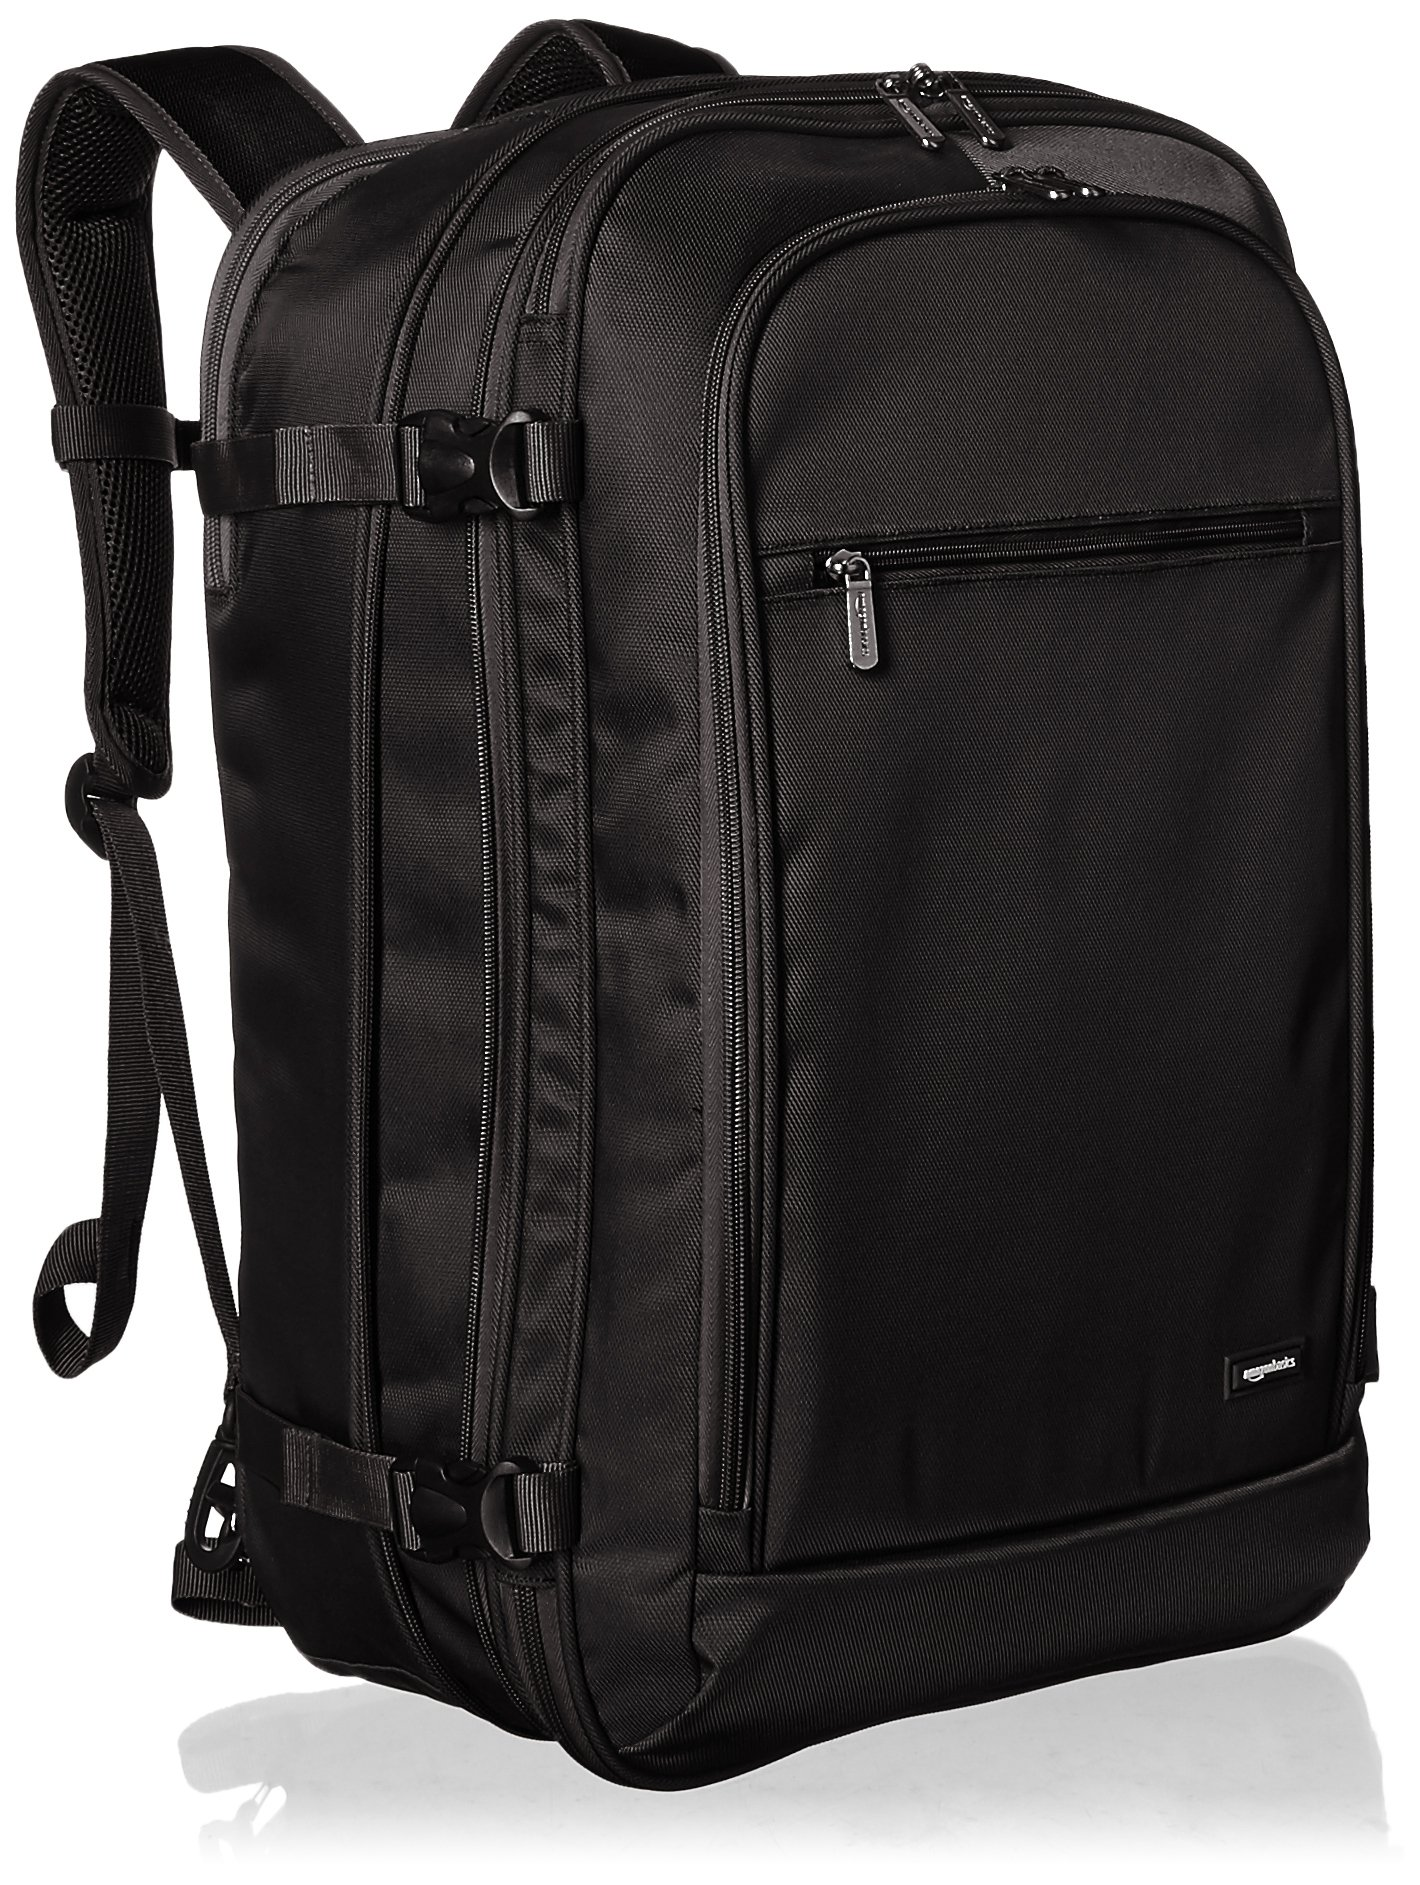 AmazonBasics - Mochila de equipaje de mano - Negro product image